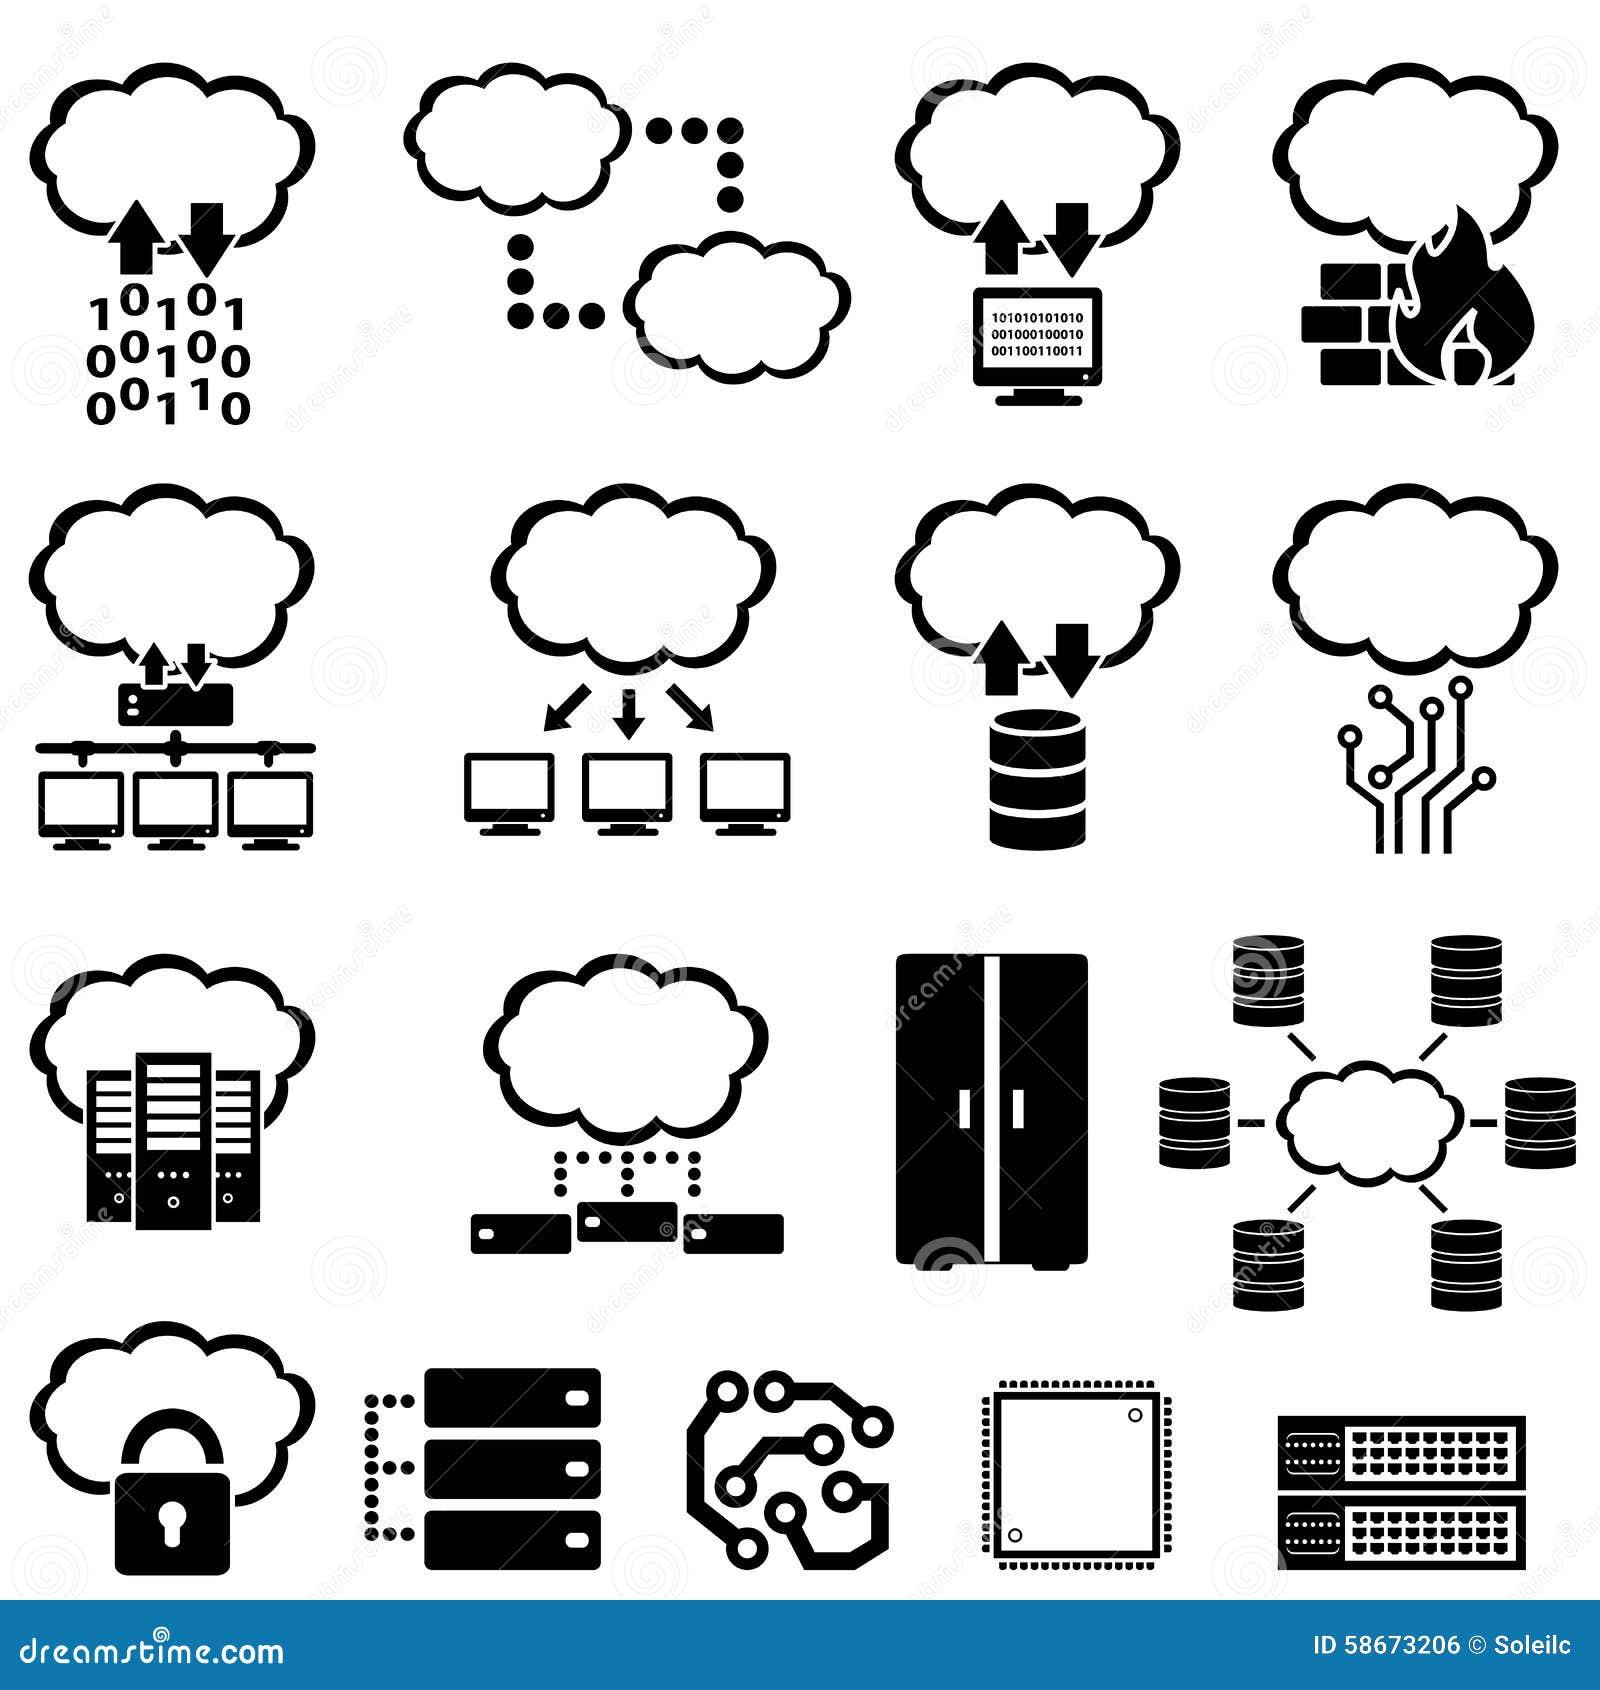 big data and cloud computing stock vector